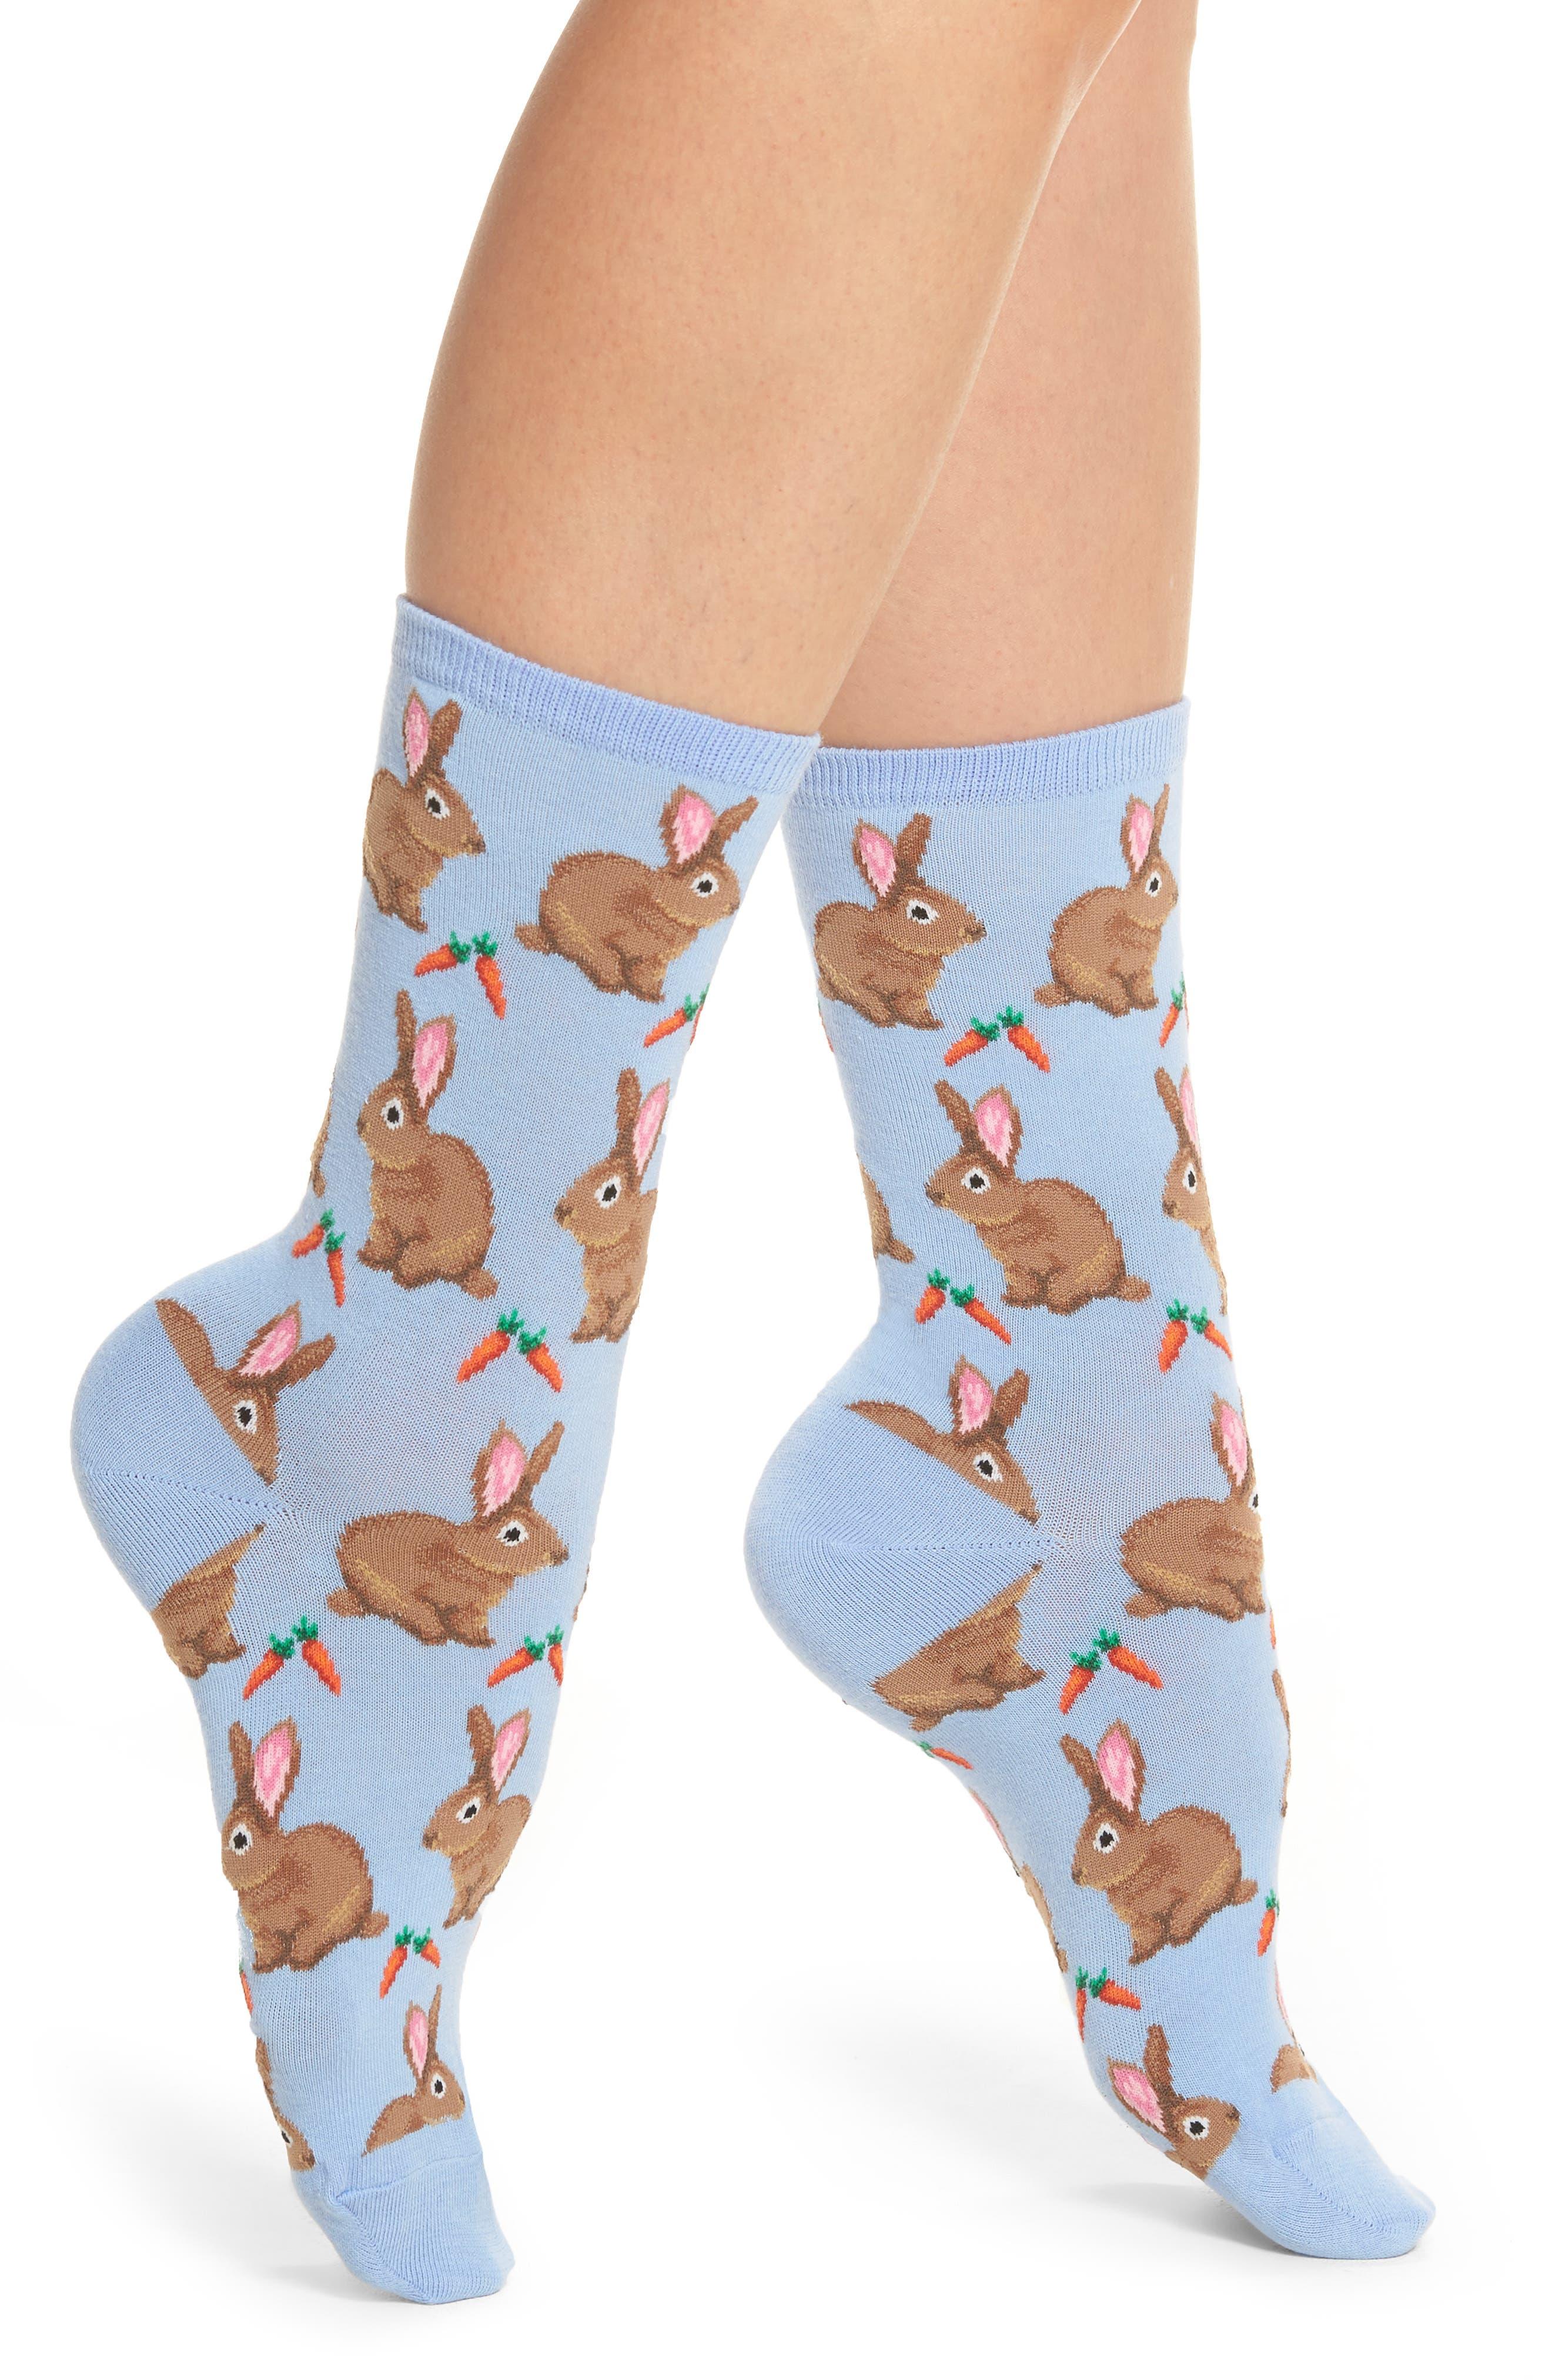 Hot Sox Bunnies Crew Socks